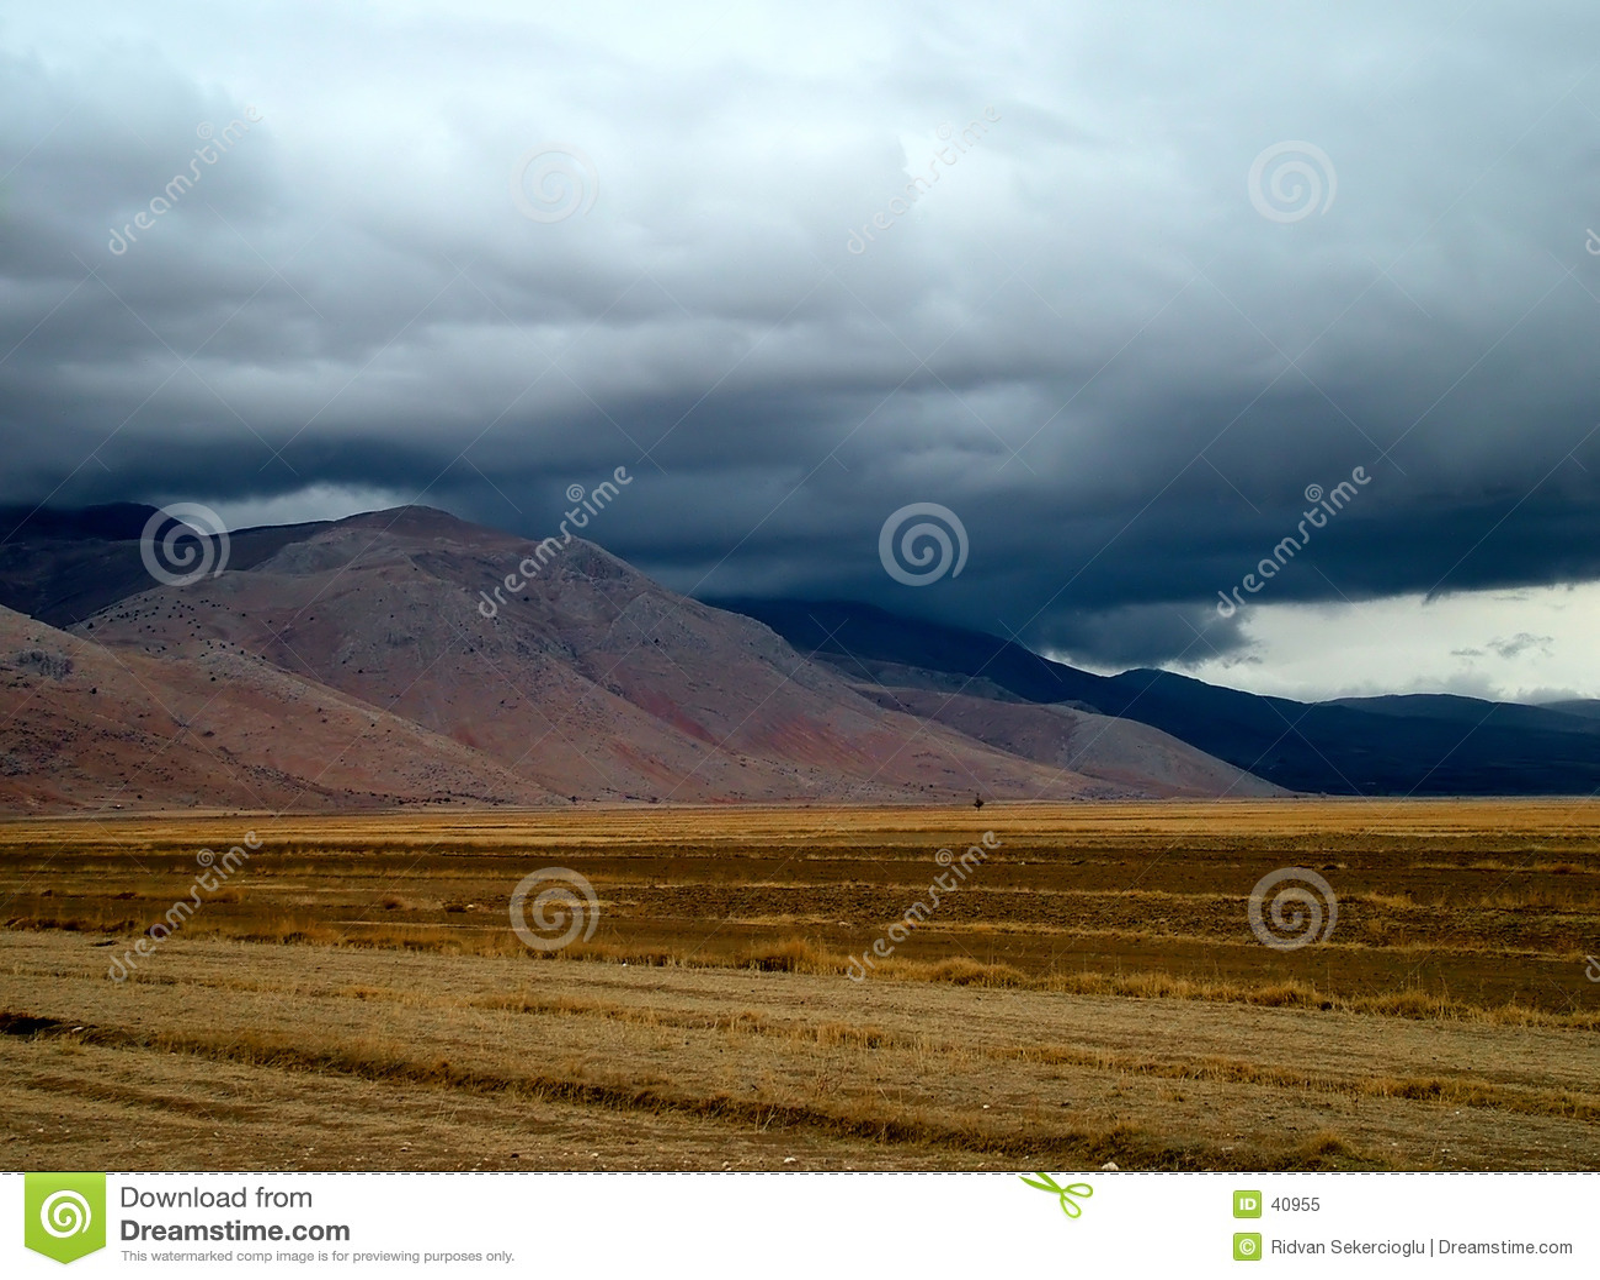 Download Antes de la lluvia imagen de archivo. Imagen de paisaje - 40955